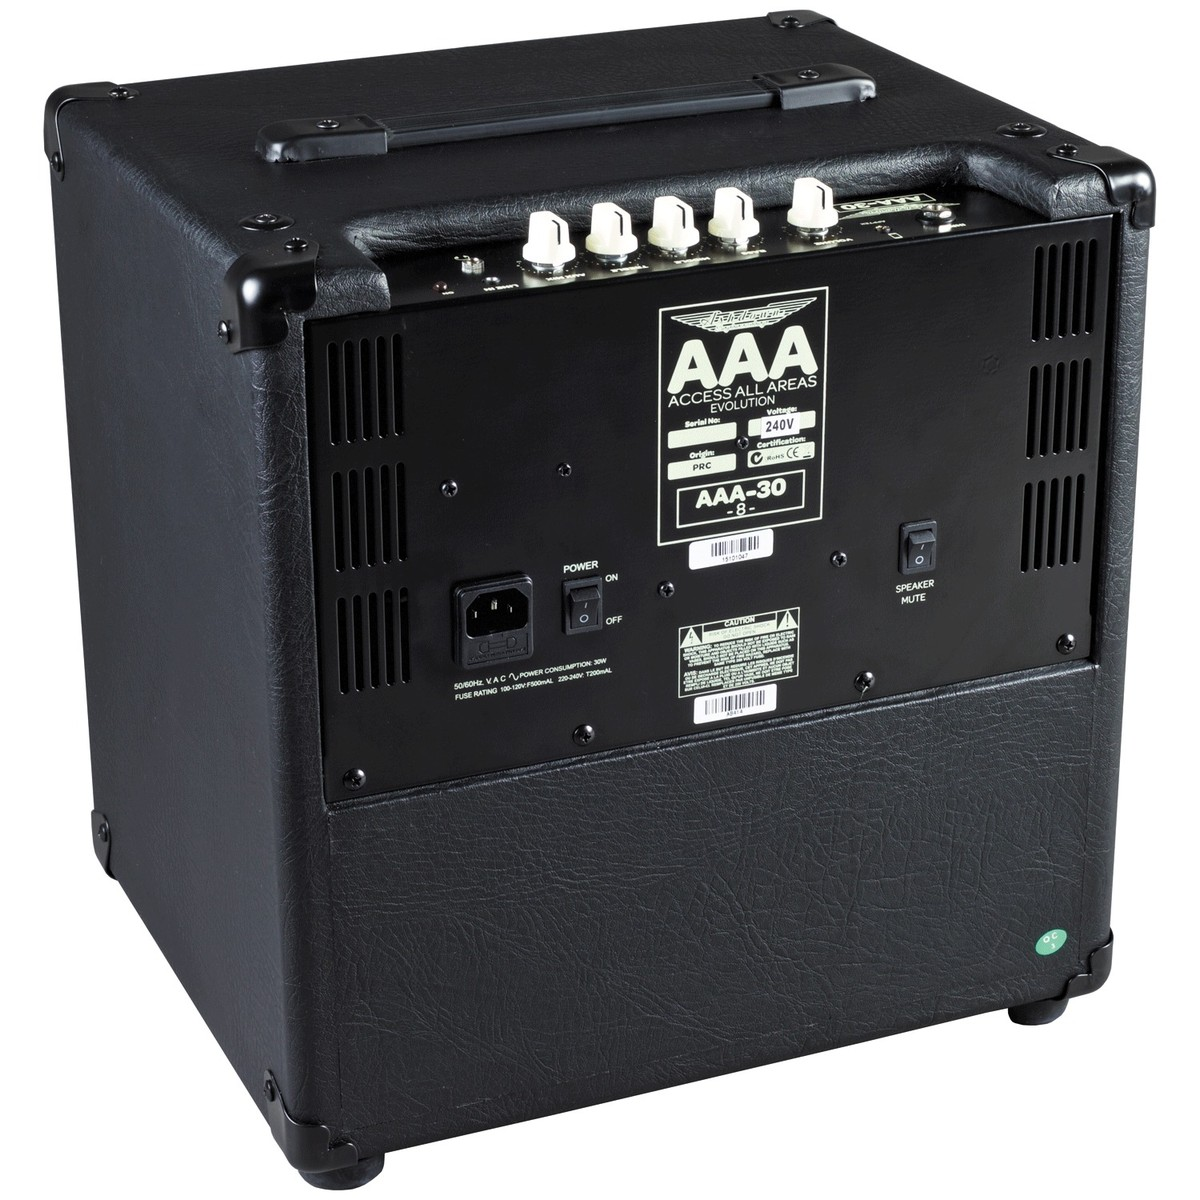 Ashdown AAA-30-EVO-8 Lightweight 30w 1 x 8